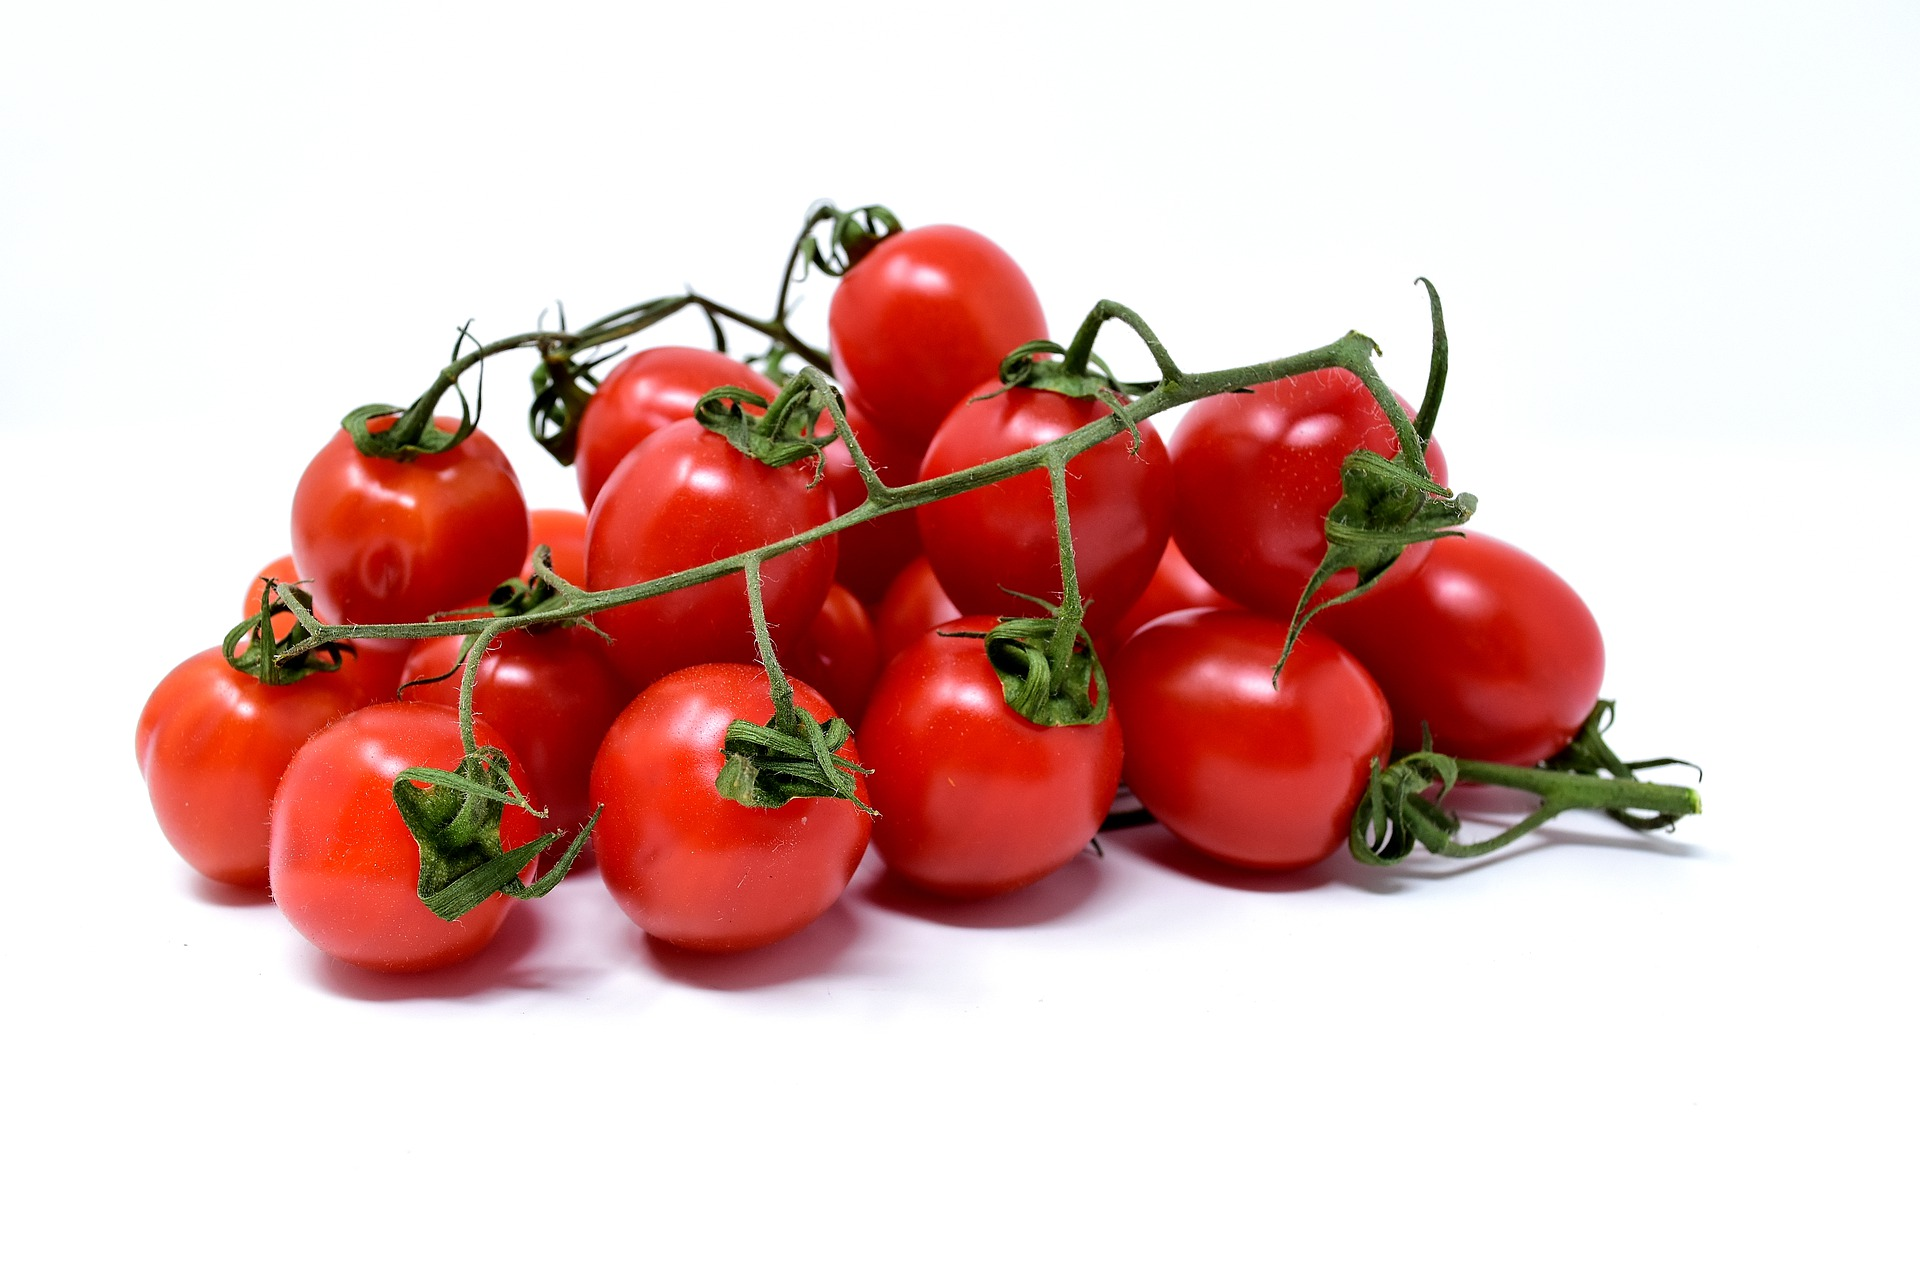 Tomatoes are a juglone sensitive crop